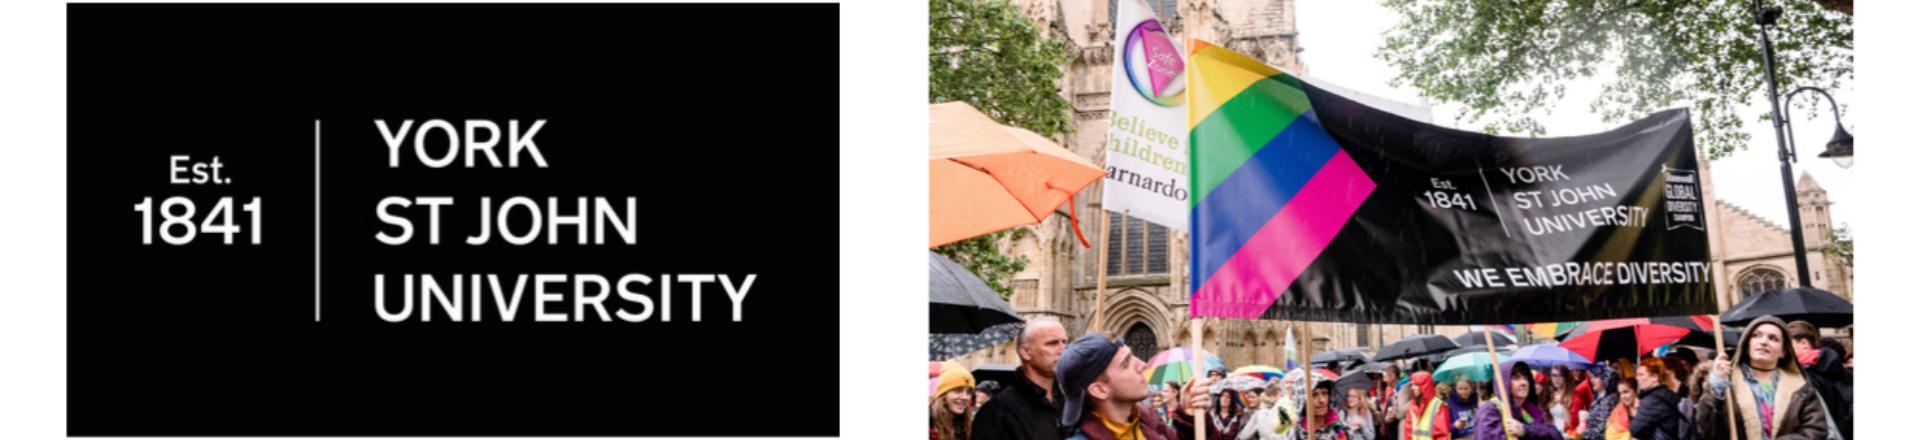 York St John Logo and banner at PRIDE 2019.